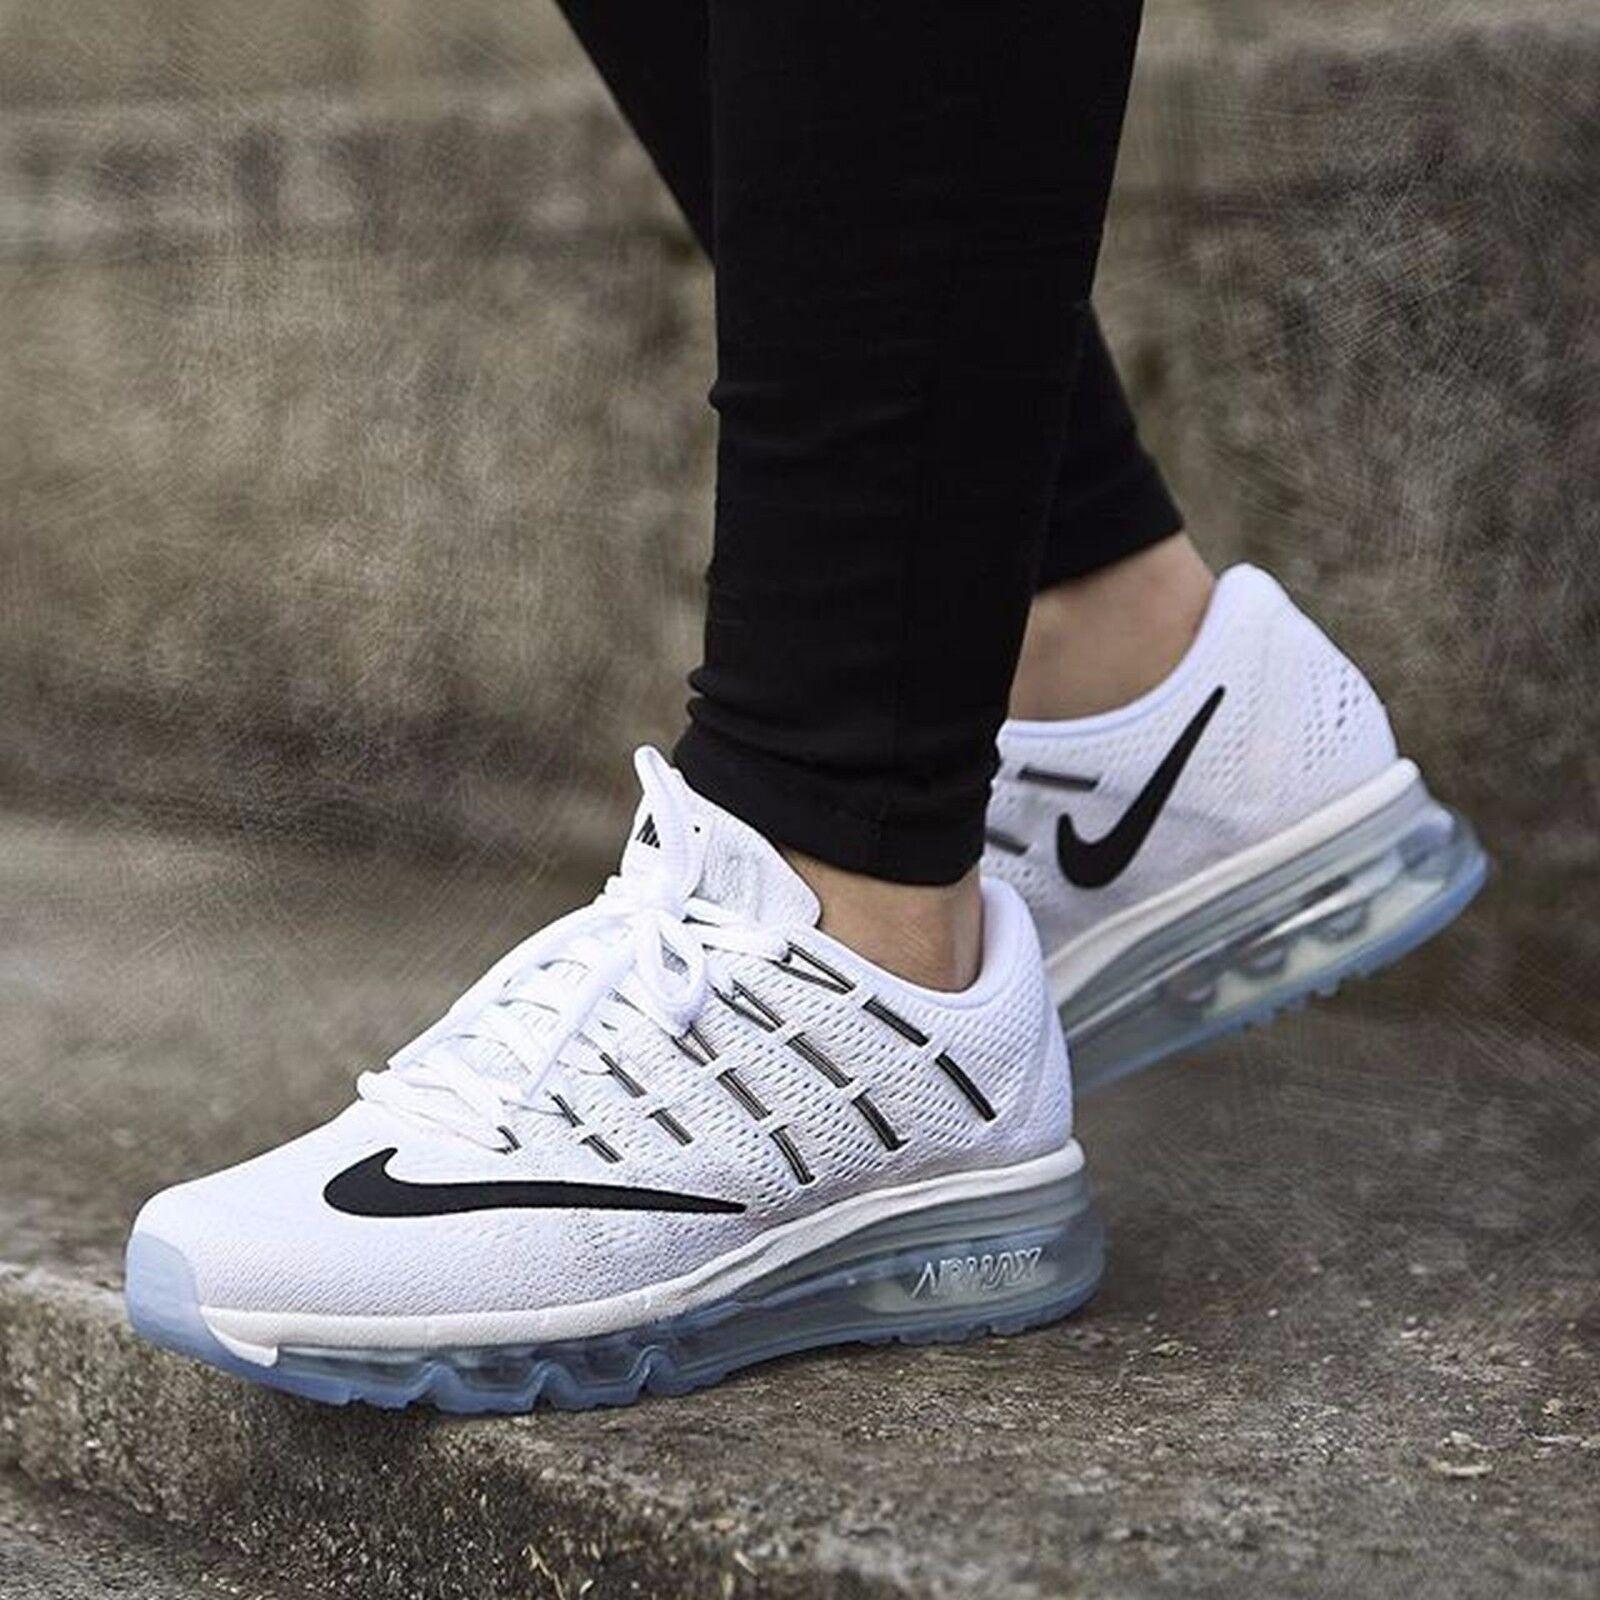 Nike Air Max 2016 Summit White Black-White 806772-100 Wmn Sz 10